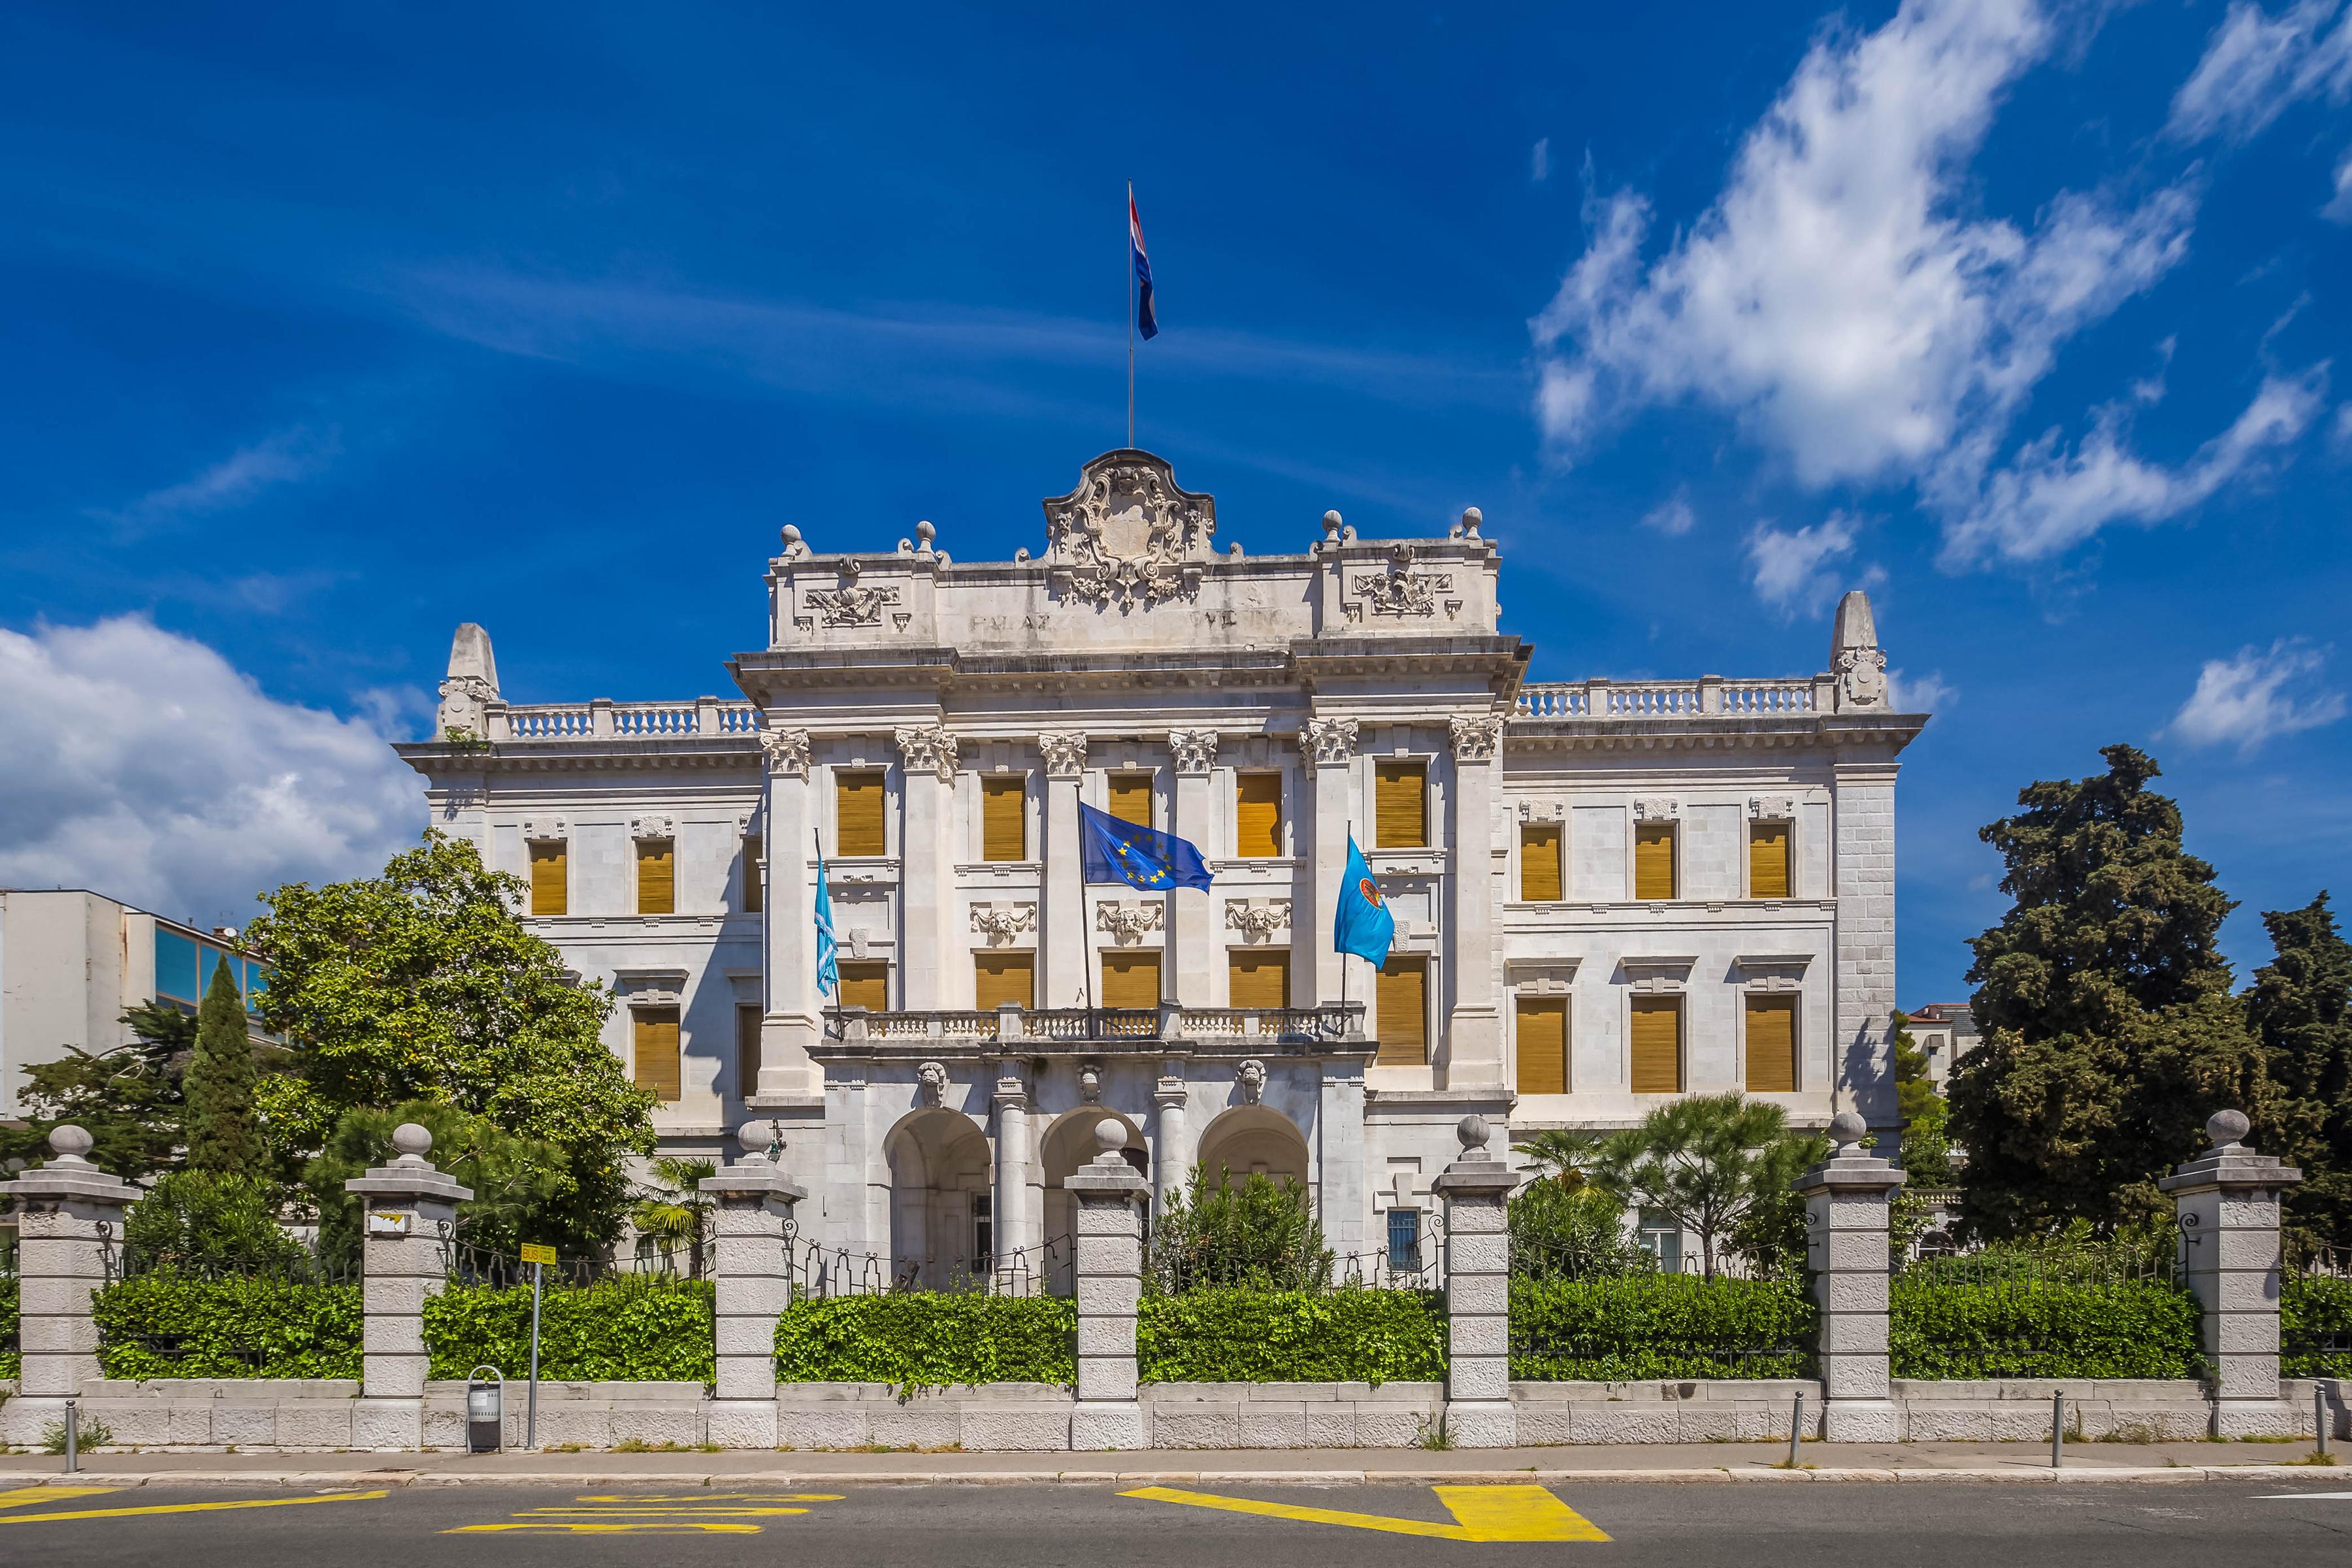 Фотография дворца Хорватия Governor palace Rijeka Флаг Забор город Дворец флага забора ограда забором Города